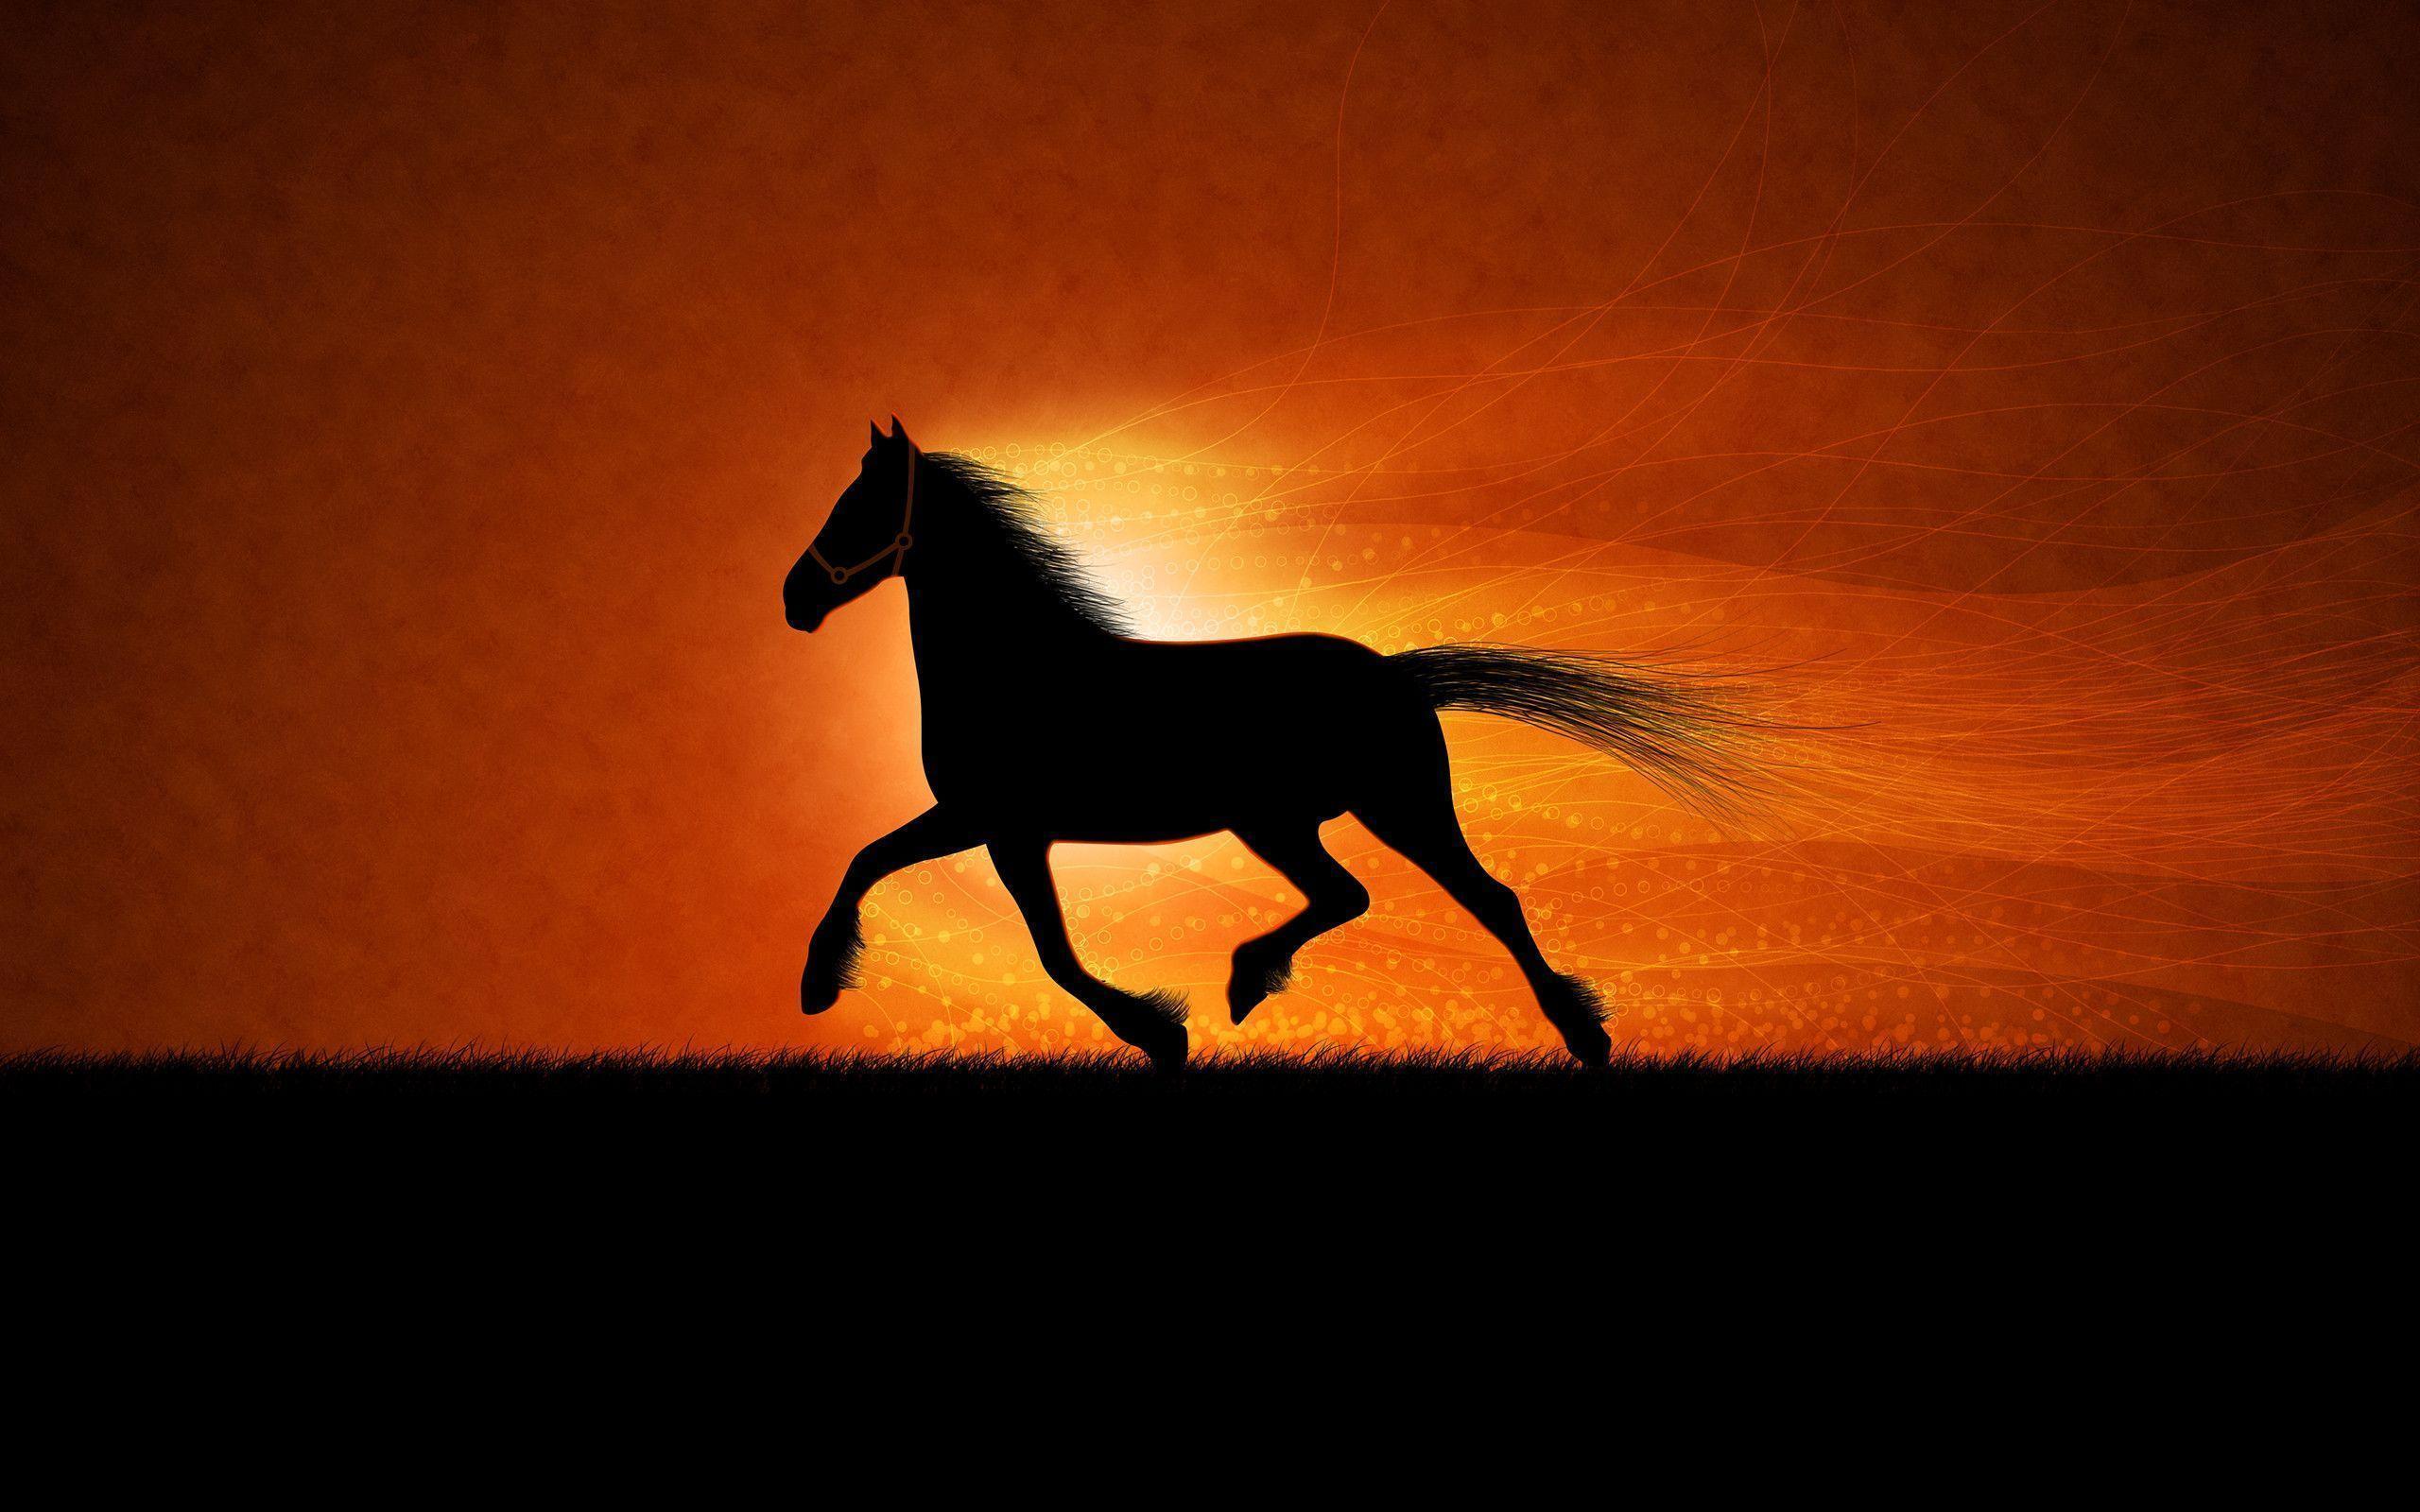 Running Horse Wallpapers Hd 2560x1600PX ~ Wallpaper Hores #6146